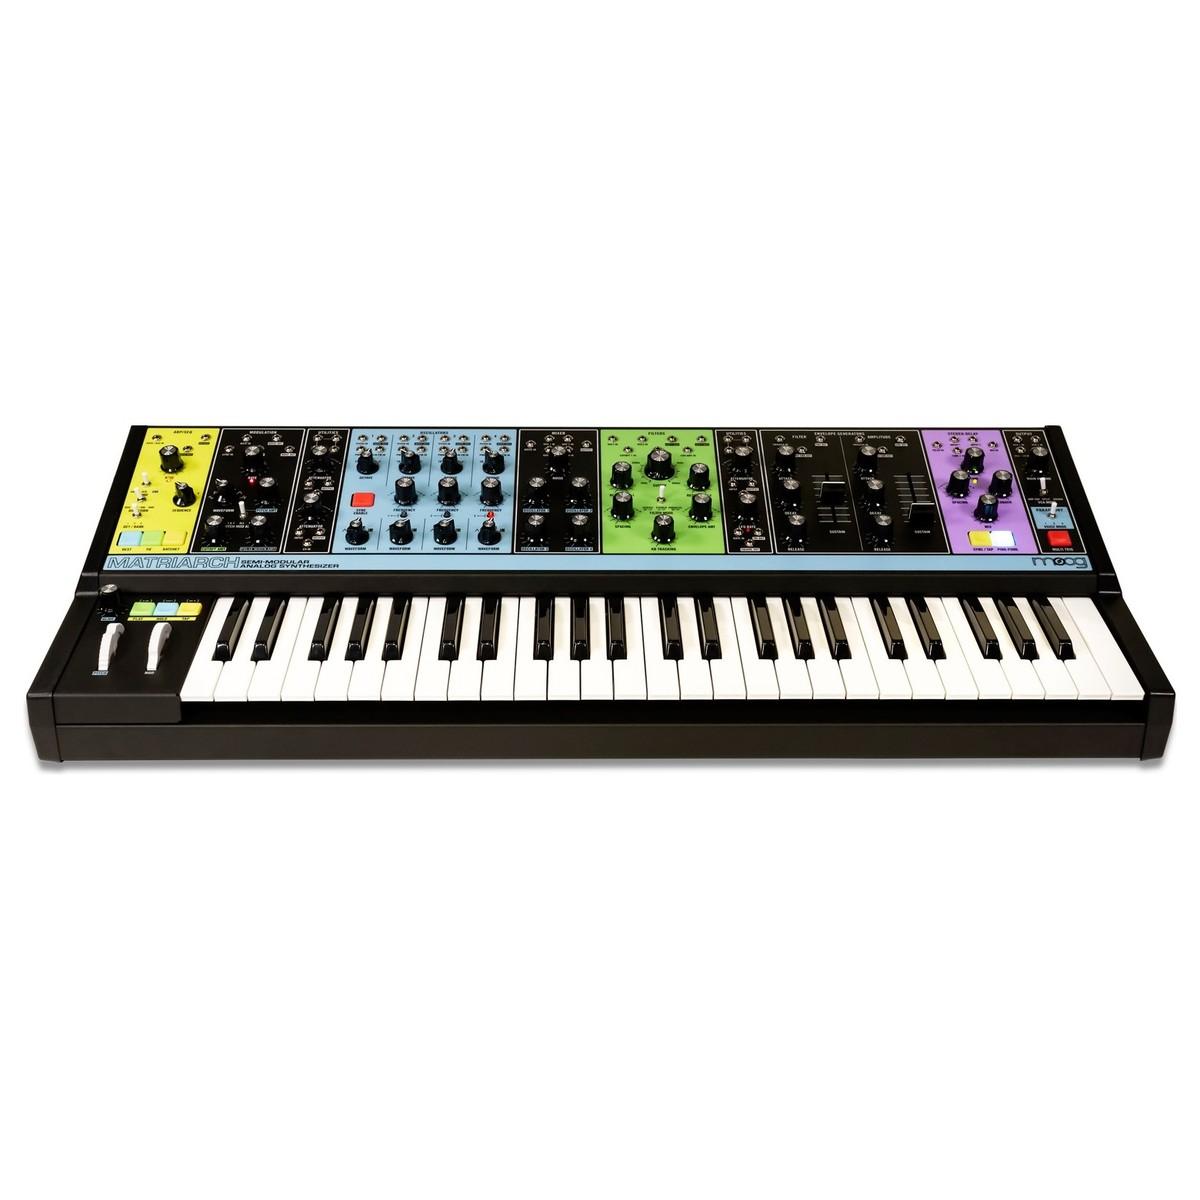 Moog MATRIARCH Semi-Modularer Analog Synthesizer [Rockshop] [Musikinstrumente]